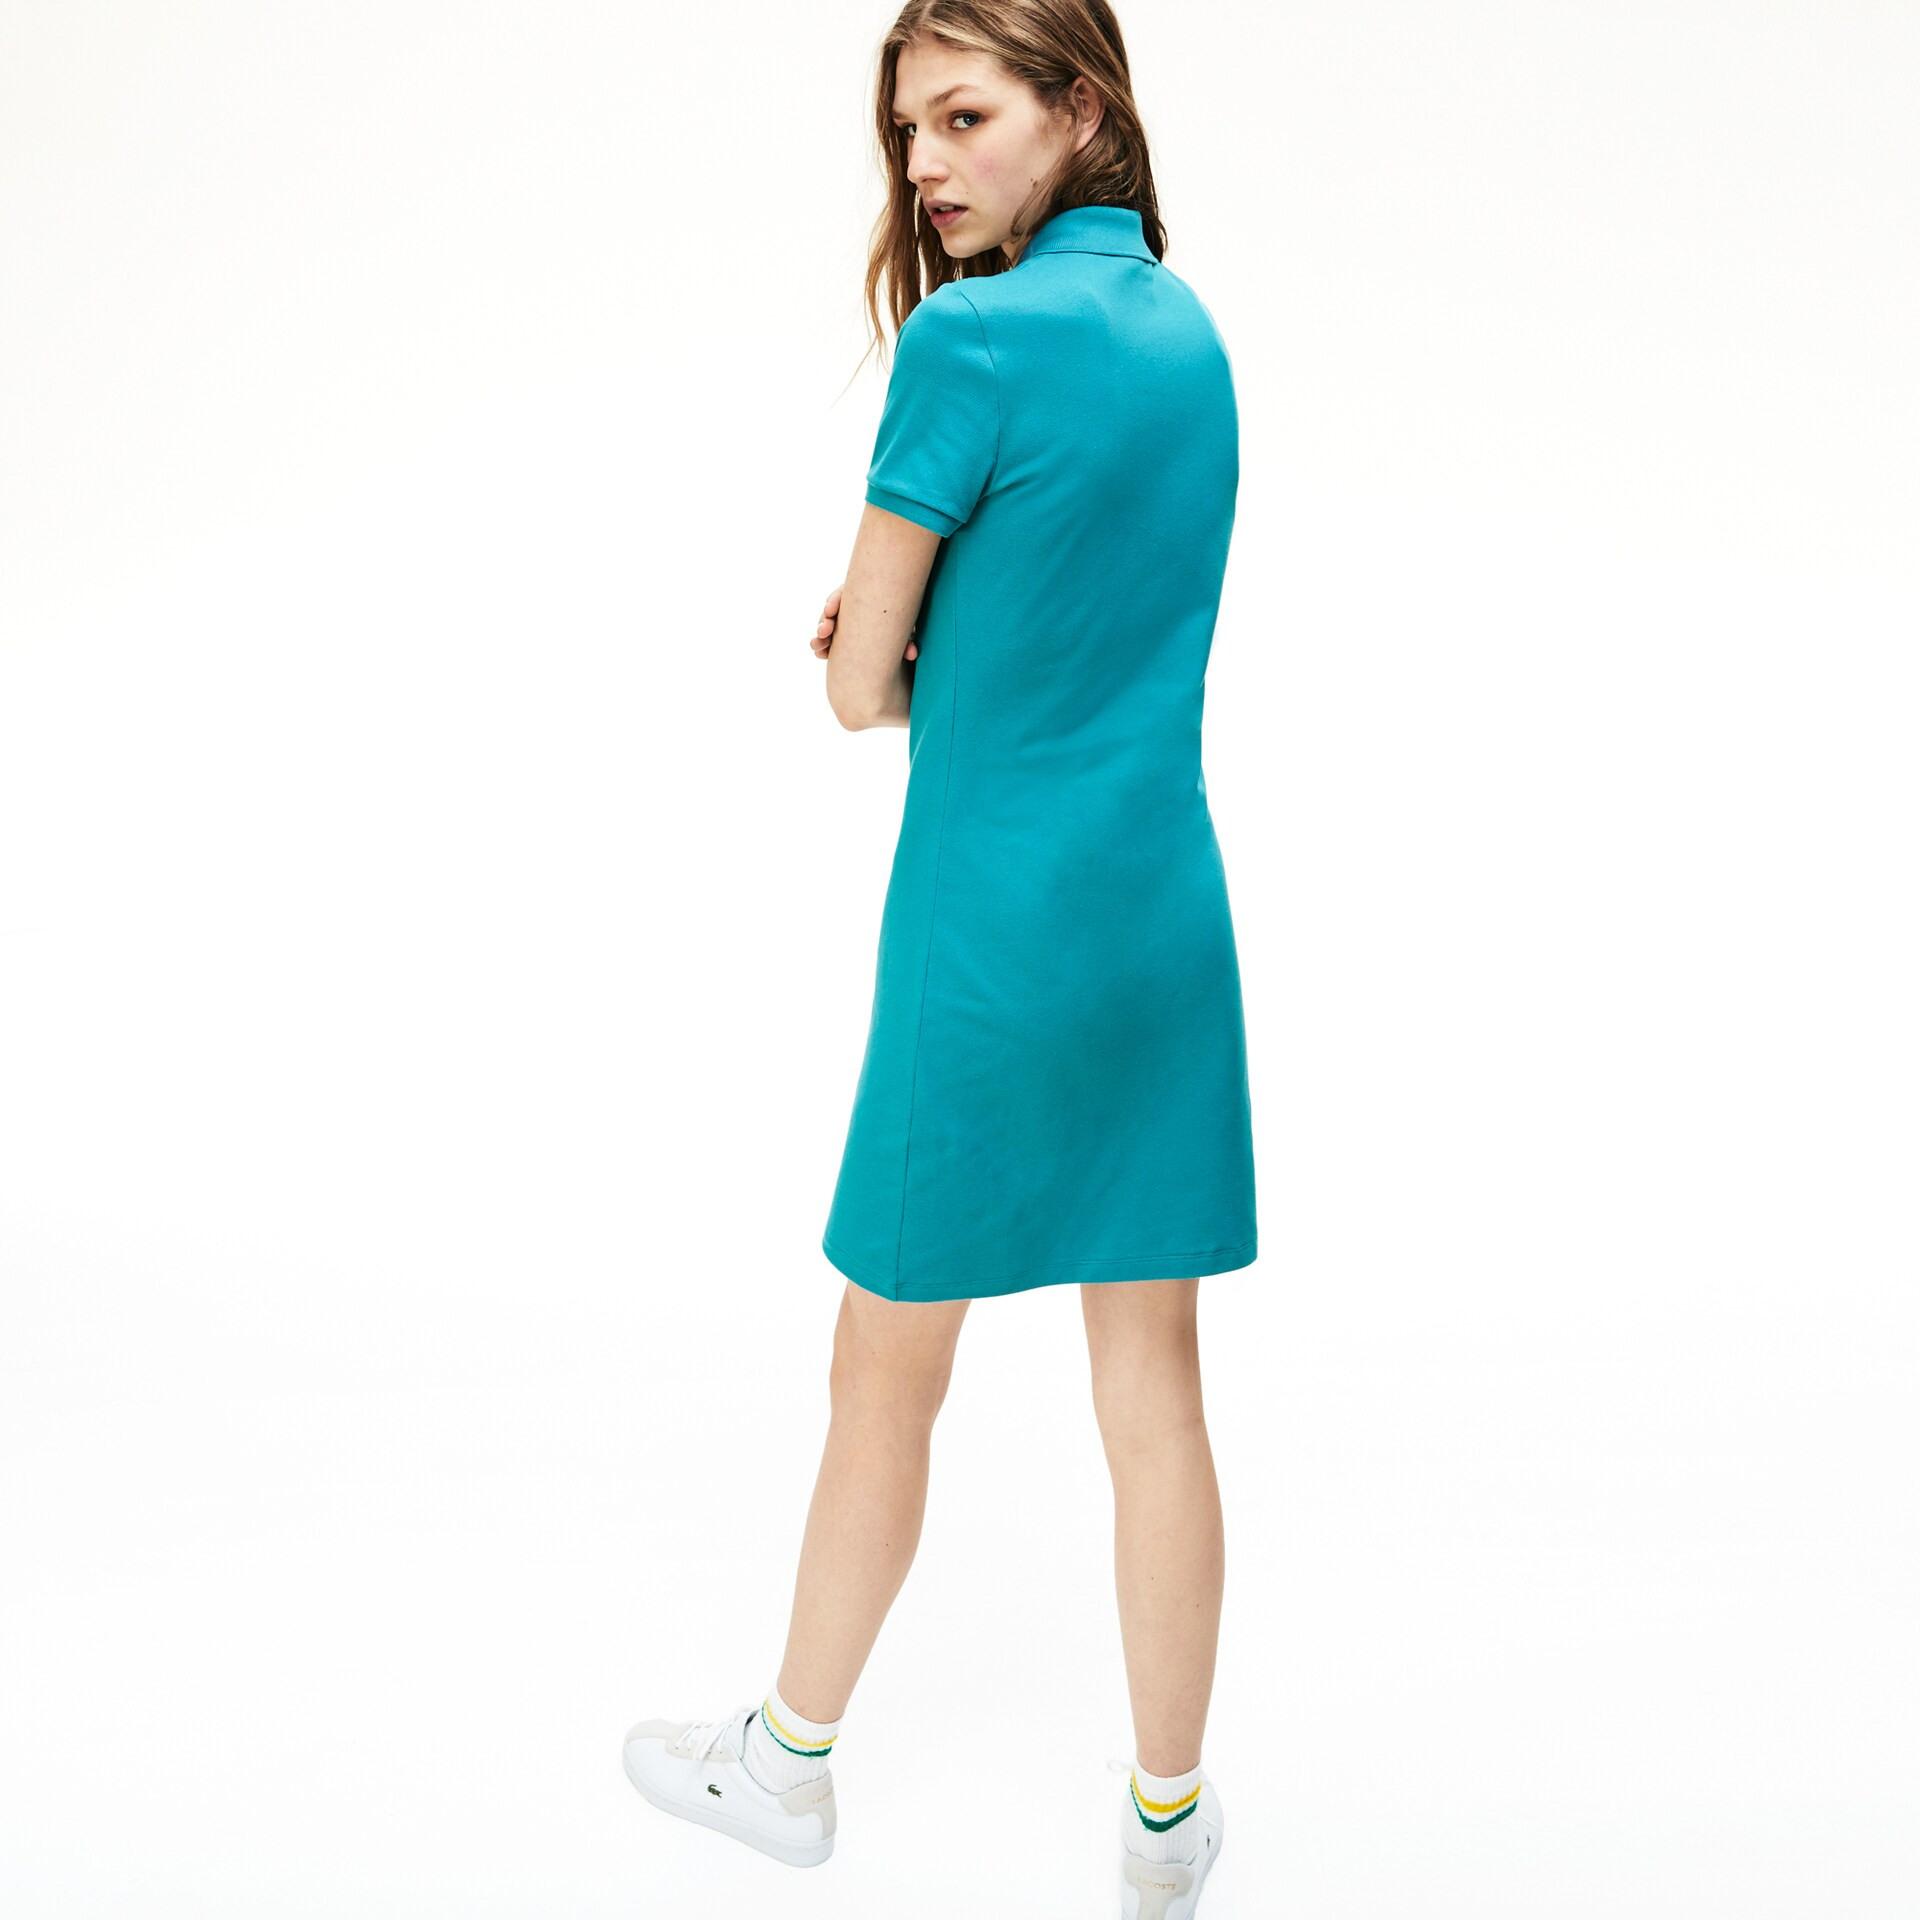 Damenpolokleid Aus Baumwollminipiqué Mit Stretch  Lacoste